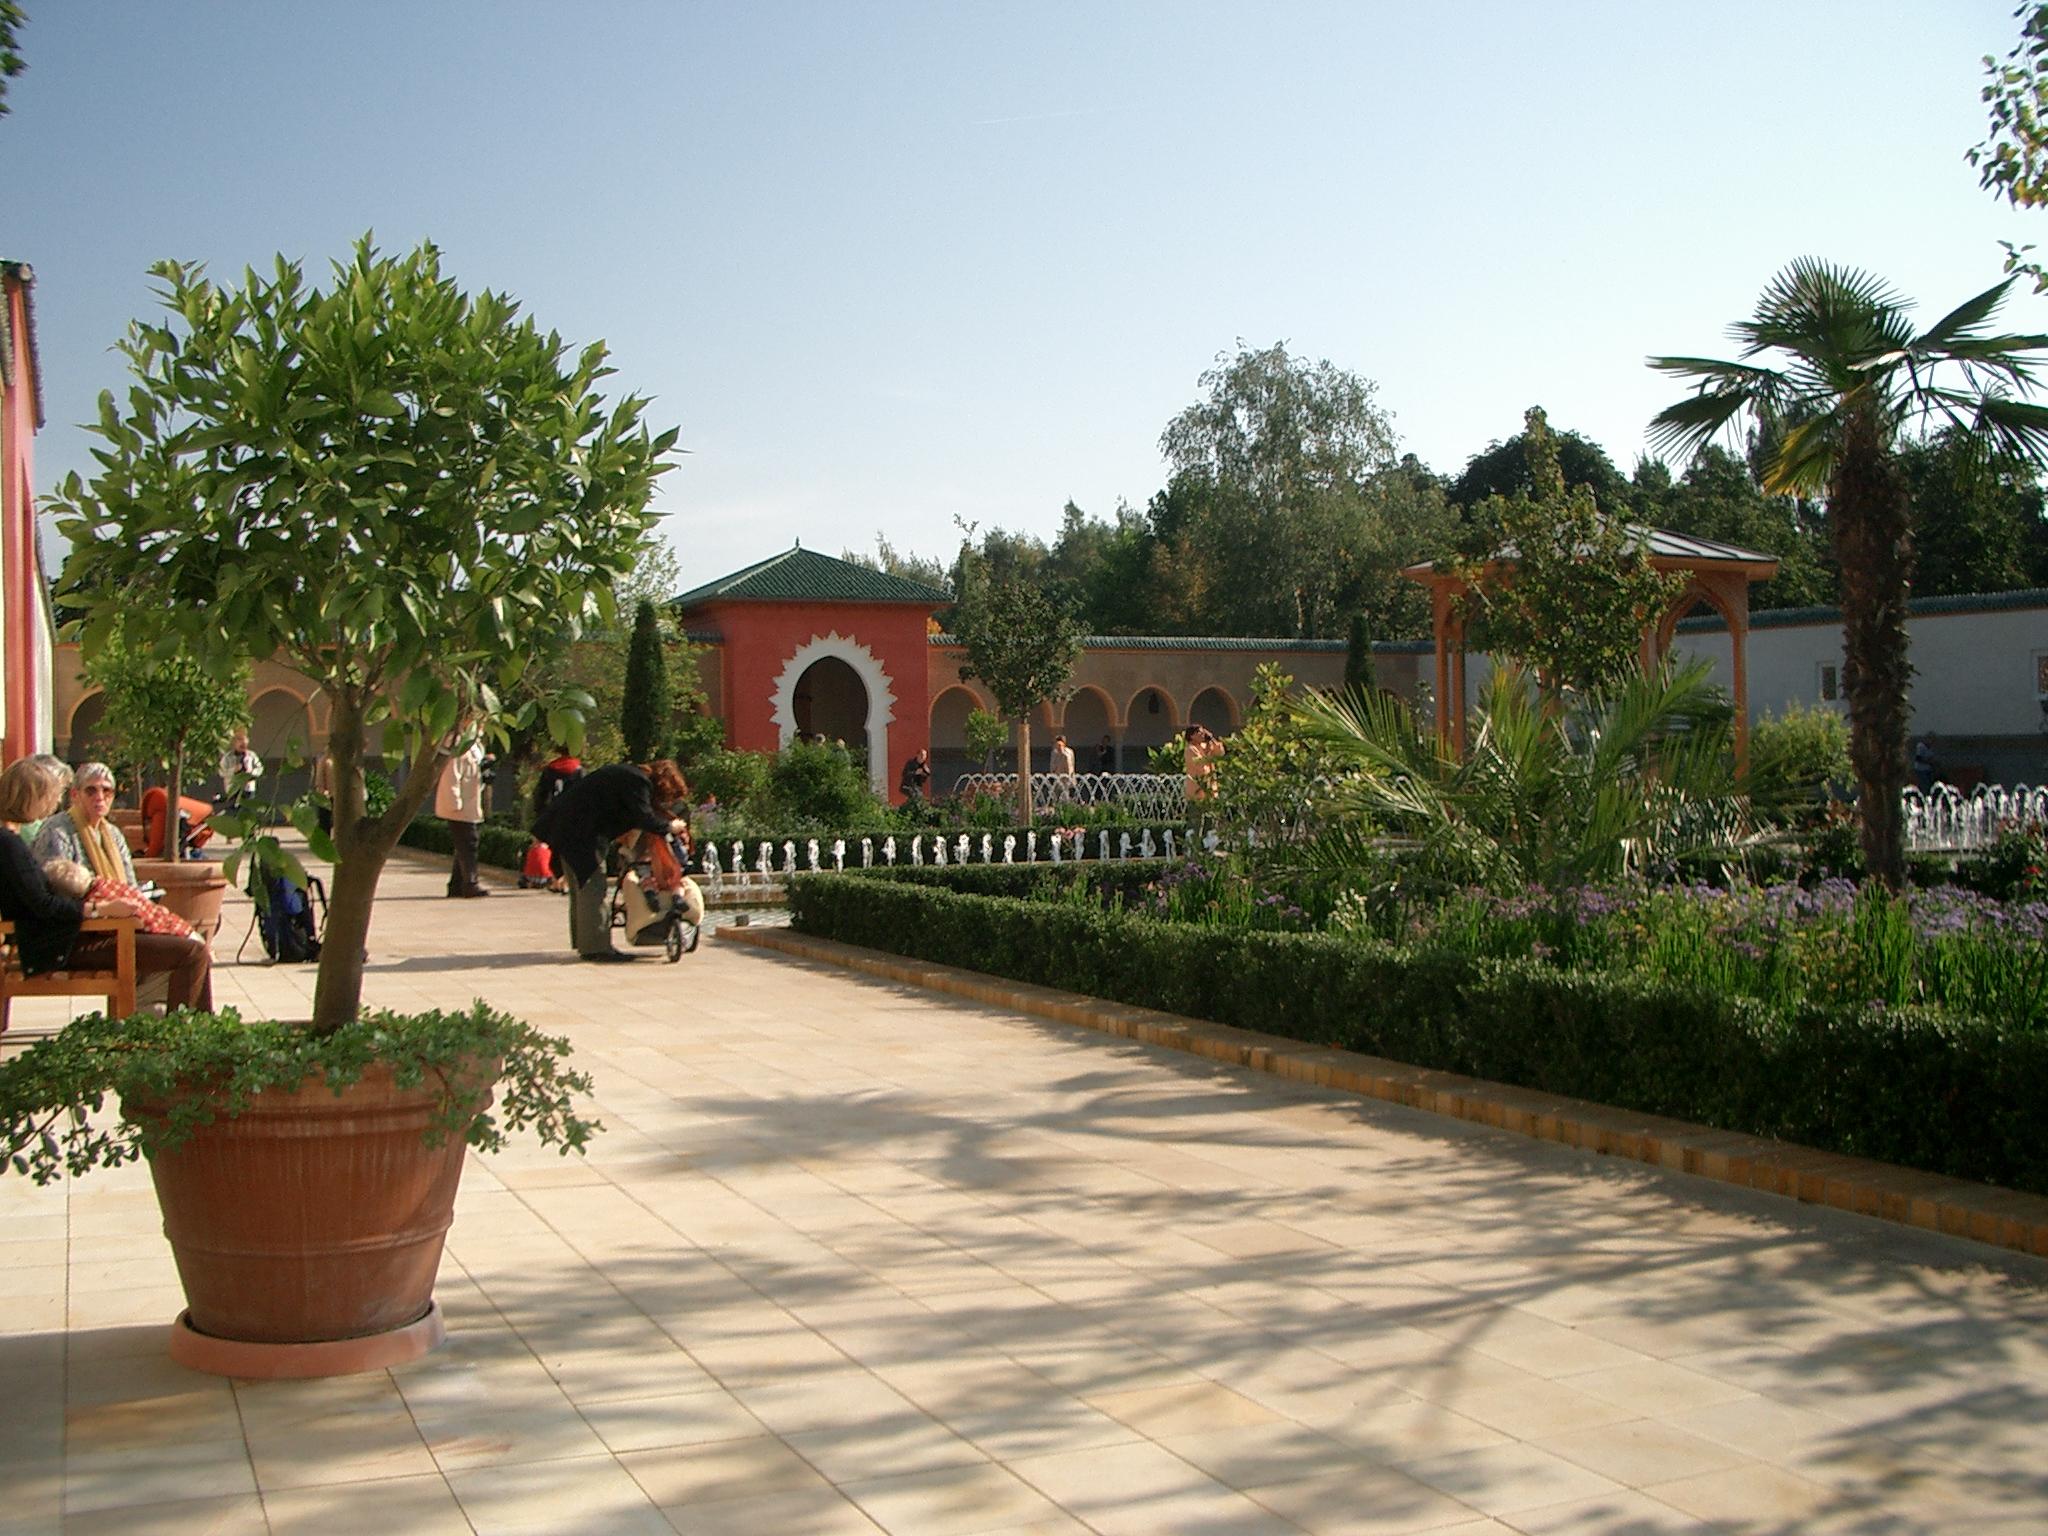 Fileorientalischer Garten Marzahnjpg  Wikimedia Commons